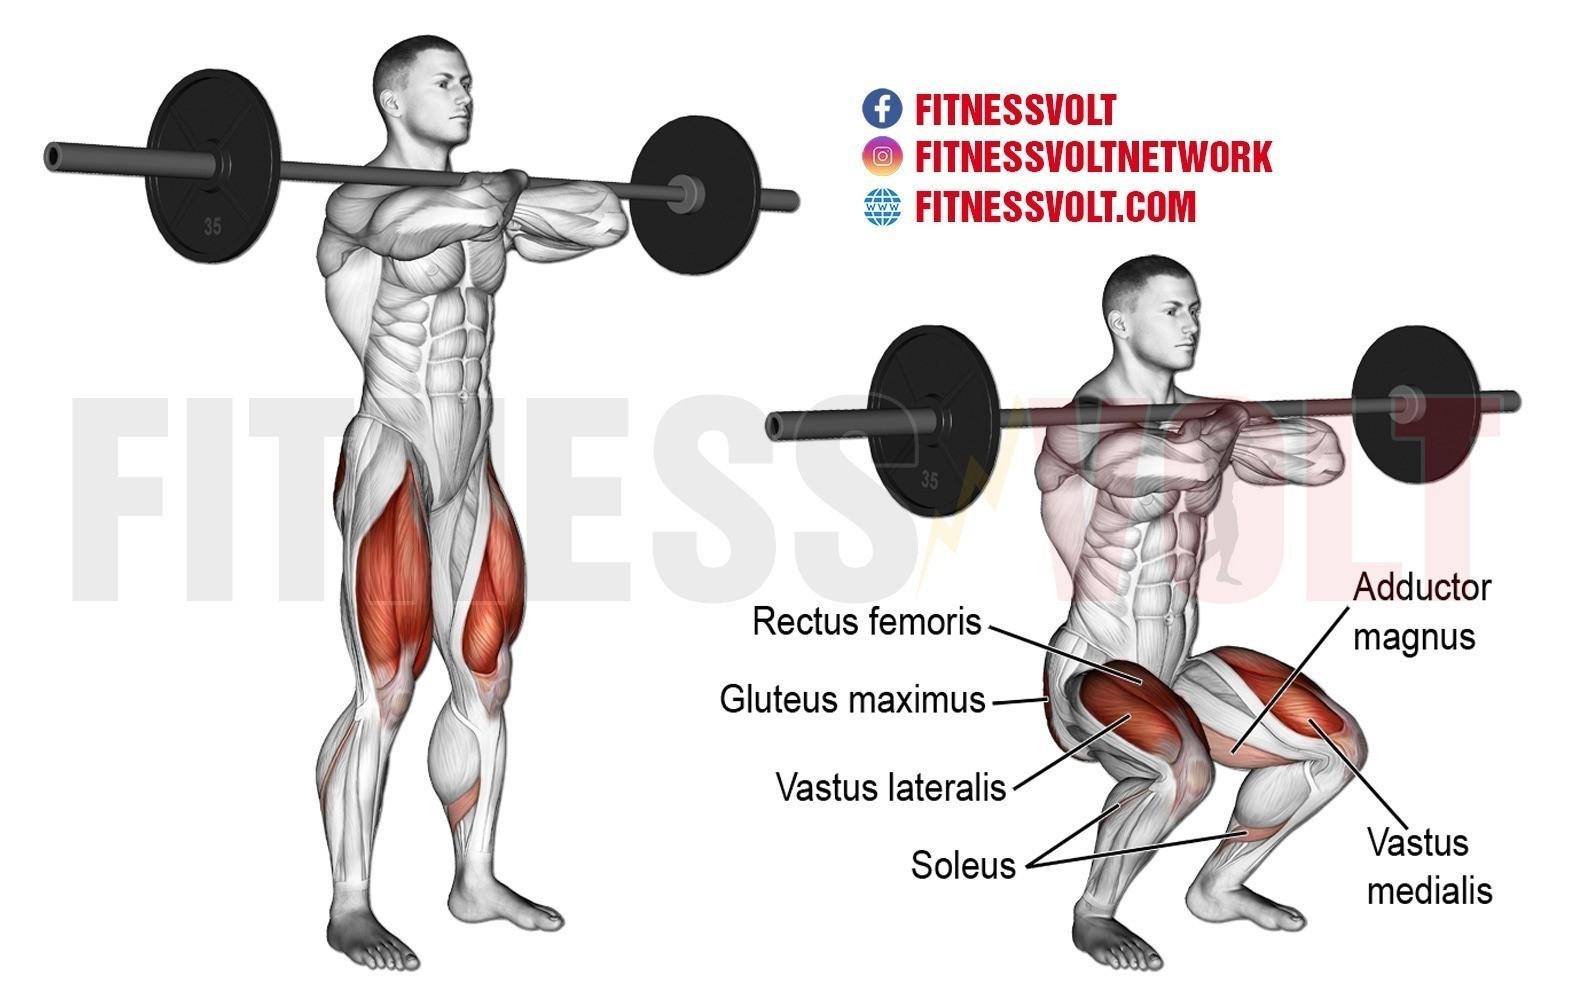 Barbell Front Squat (Legs) – Fitness Volt